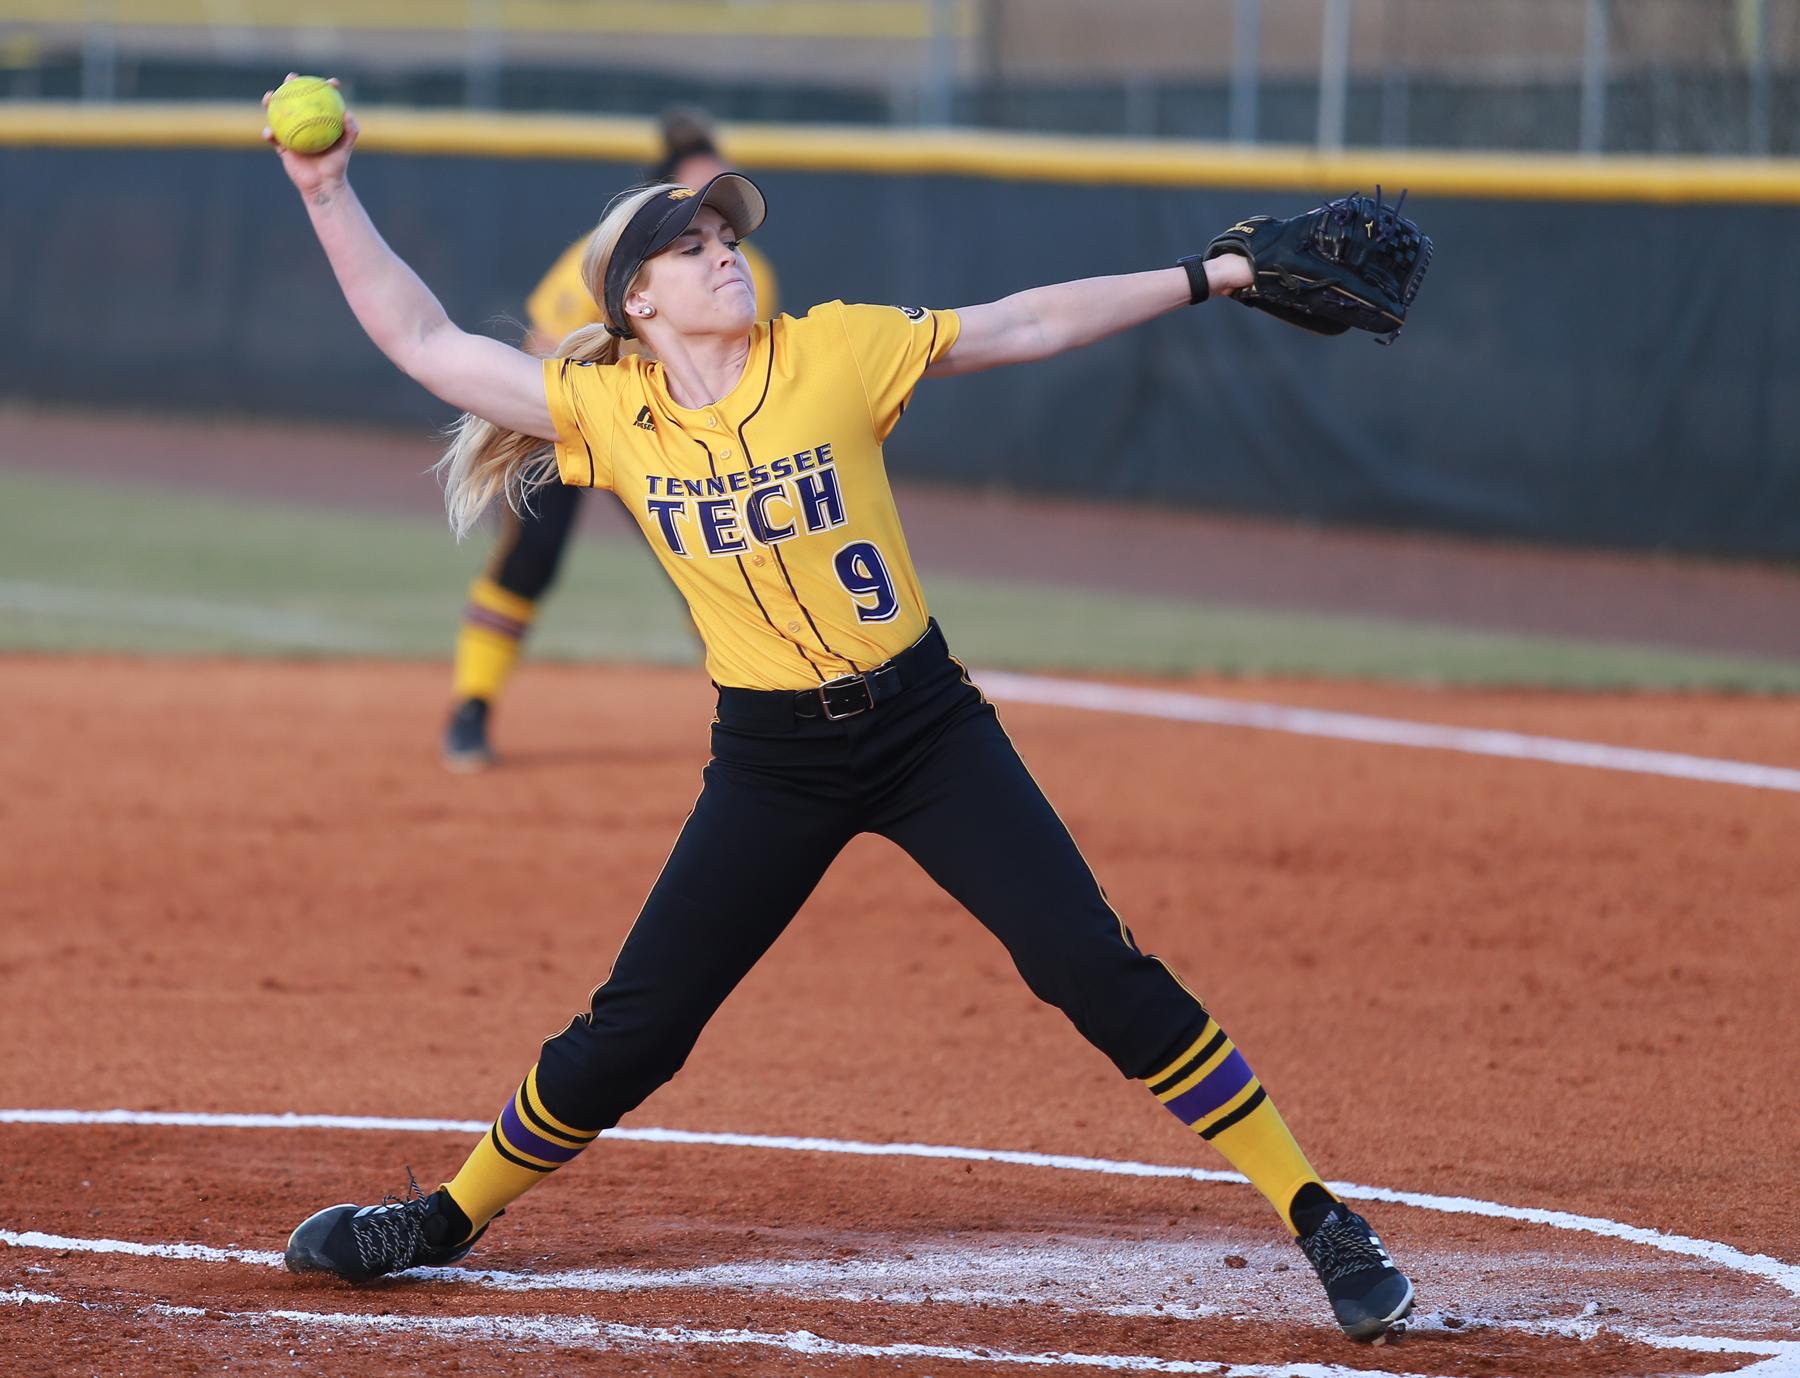 Tennessee Tech's Taylor Waldrop